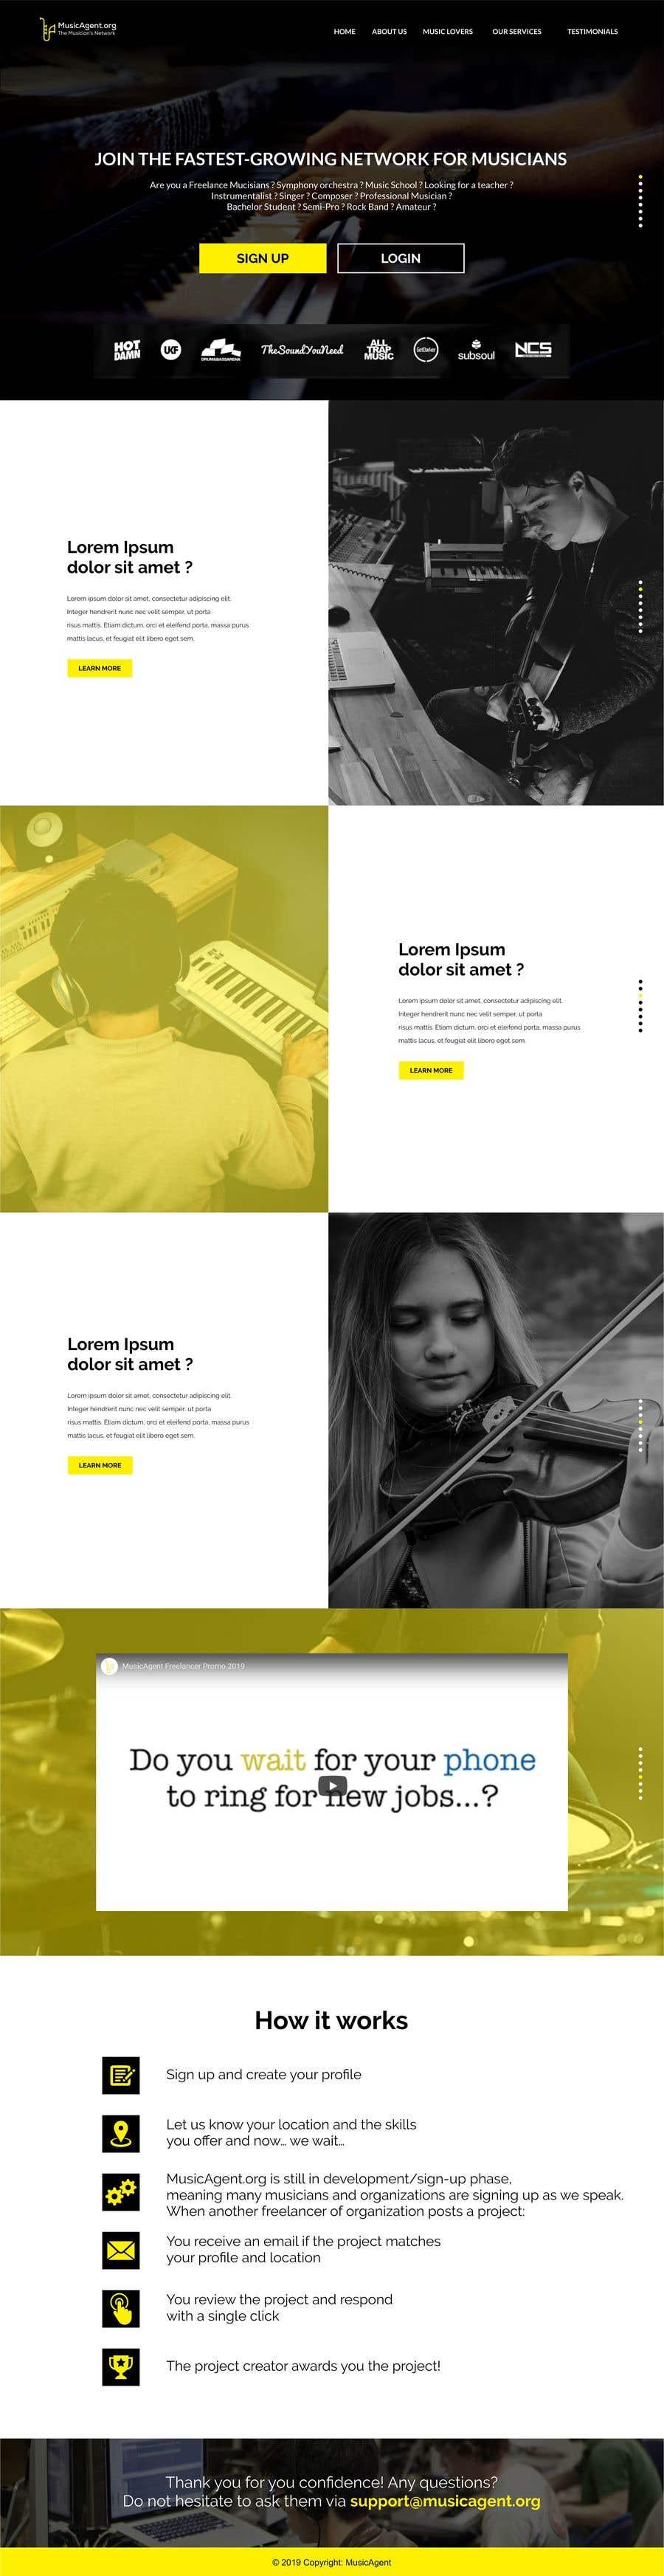 Penyertaan Peraduan #3 untuk Creative minds needed: help us get our message across by designing an explanatory page